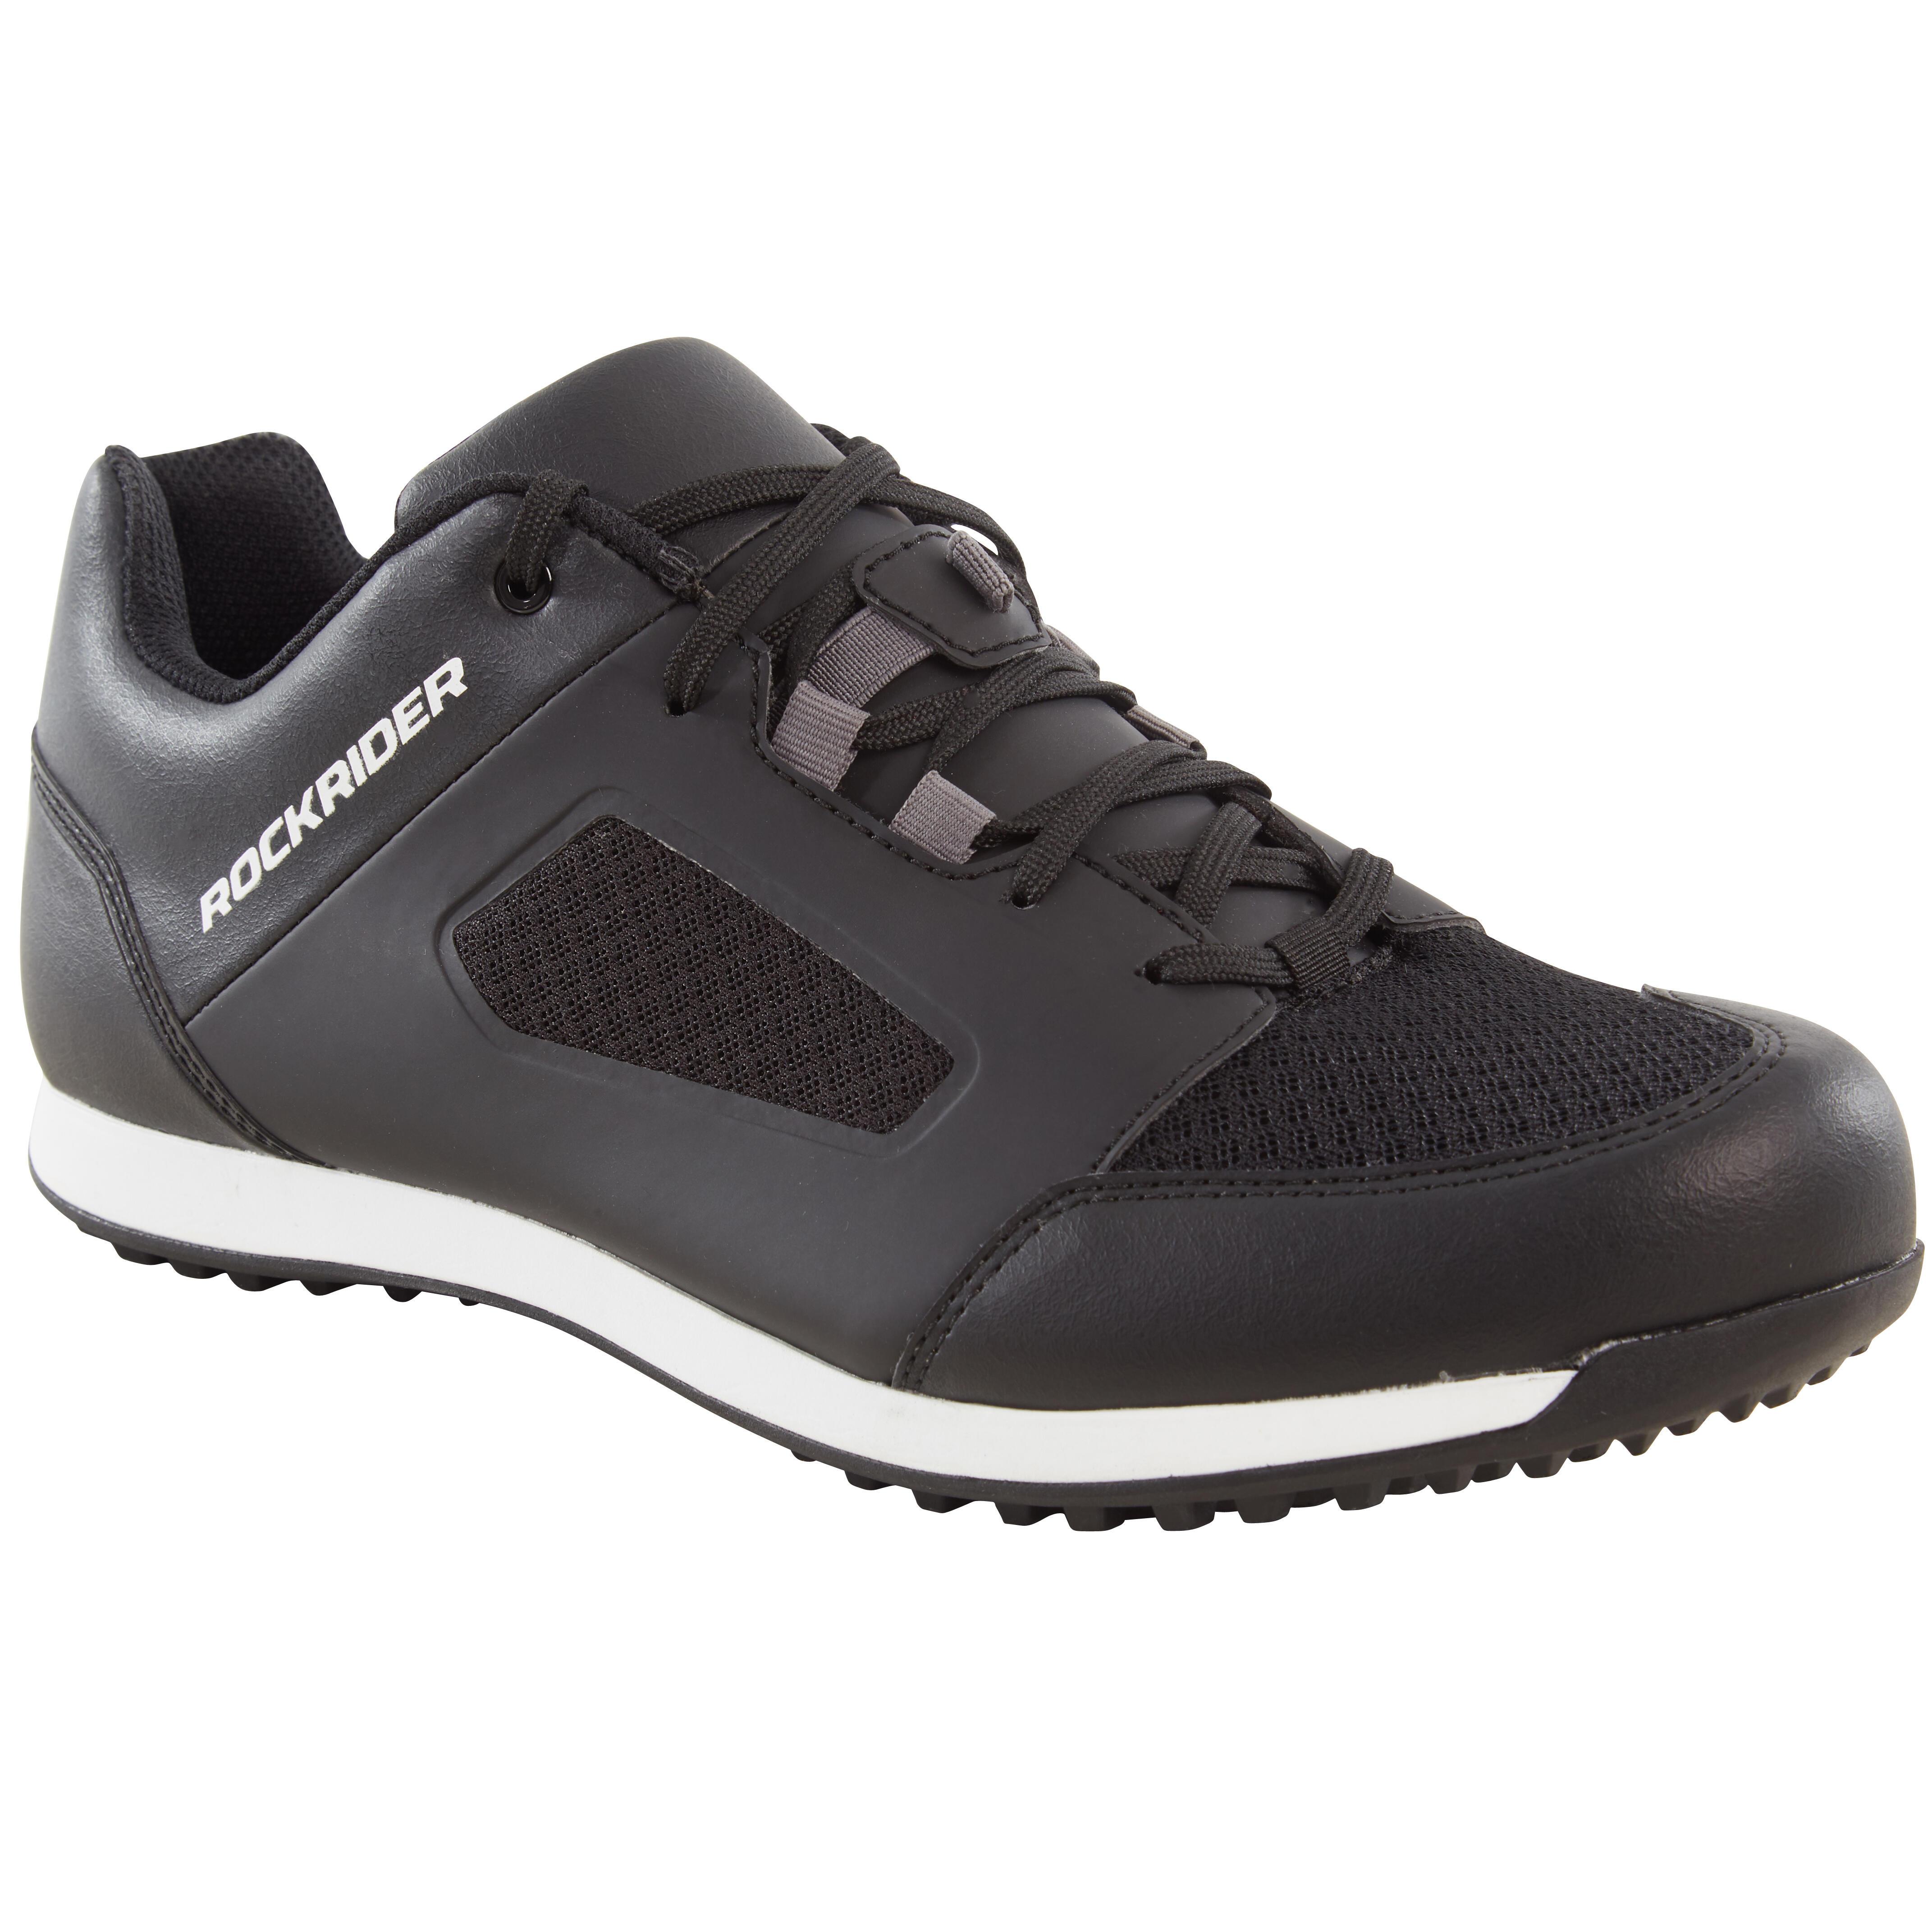 Rockrider MTB-schoenen ST 100 zwart kopen